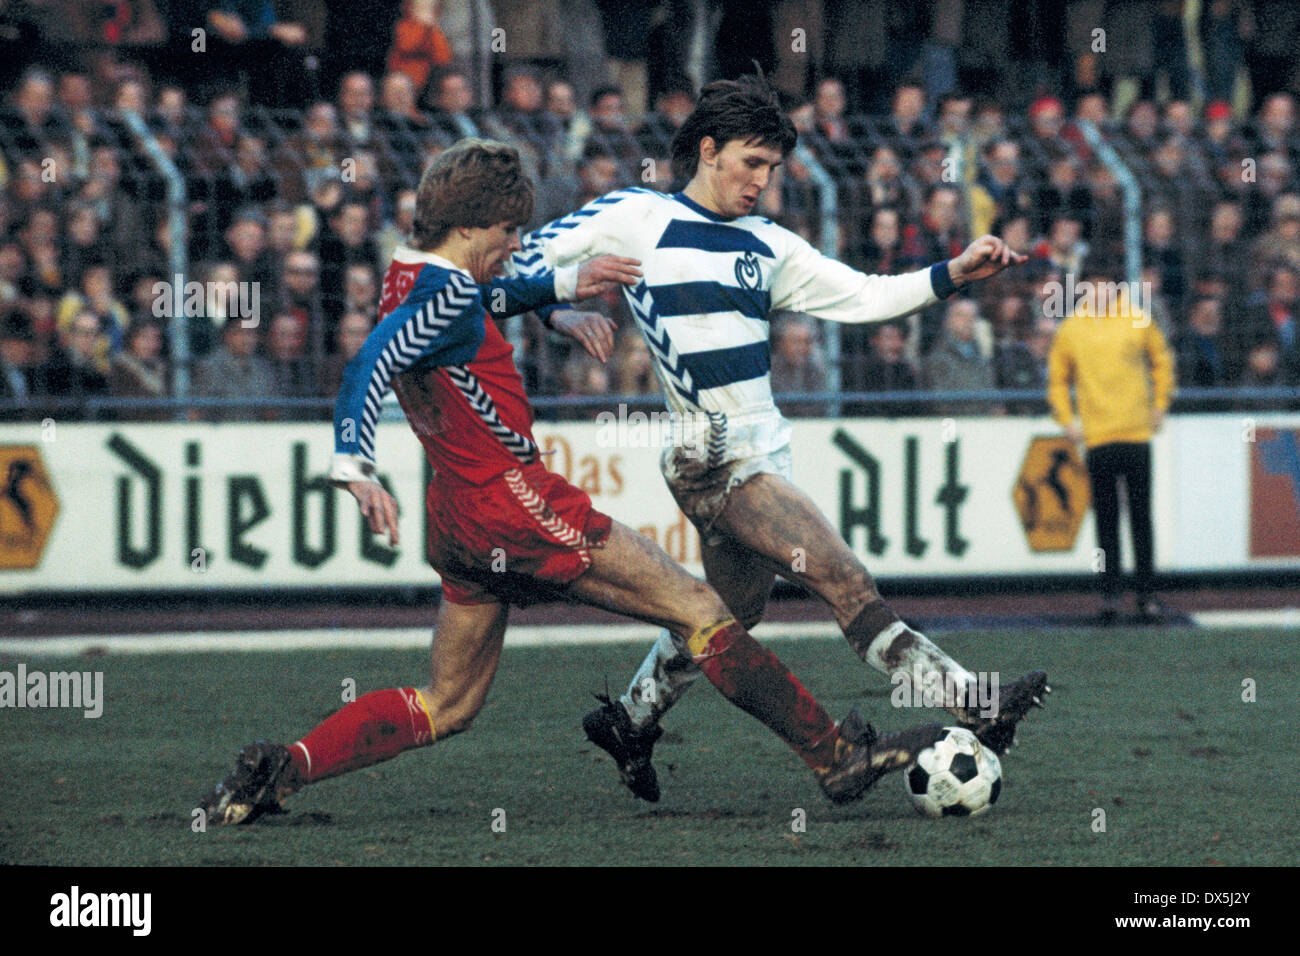 football, Bundesliga, 1975/1976, Grotenburg Stadium, FC Bayer 05 Uerdingen versus MSV Duisburg 0:4, scene of the match, Norbert Brinkmann (05) left and Ronald Worm (MSV), triple goal scorer - Stock Image